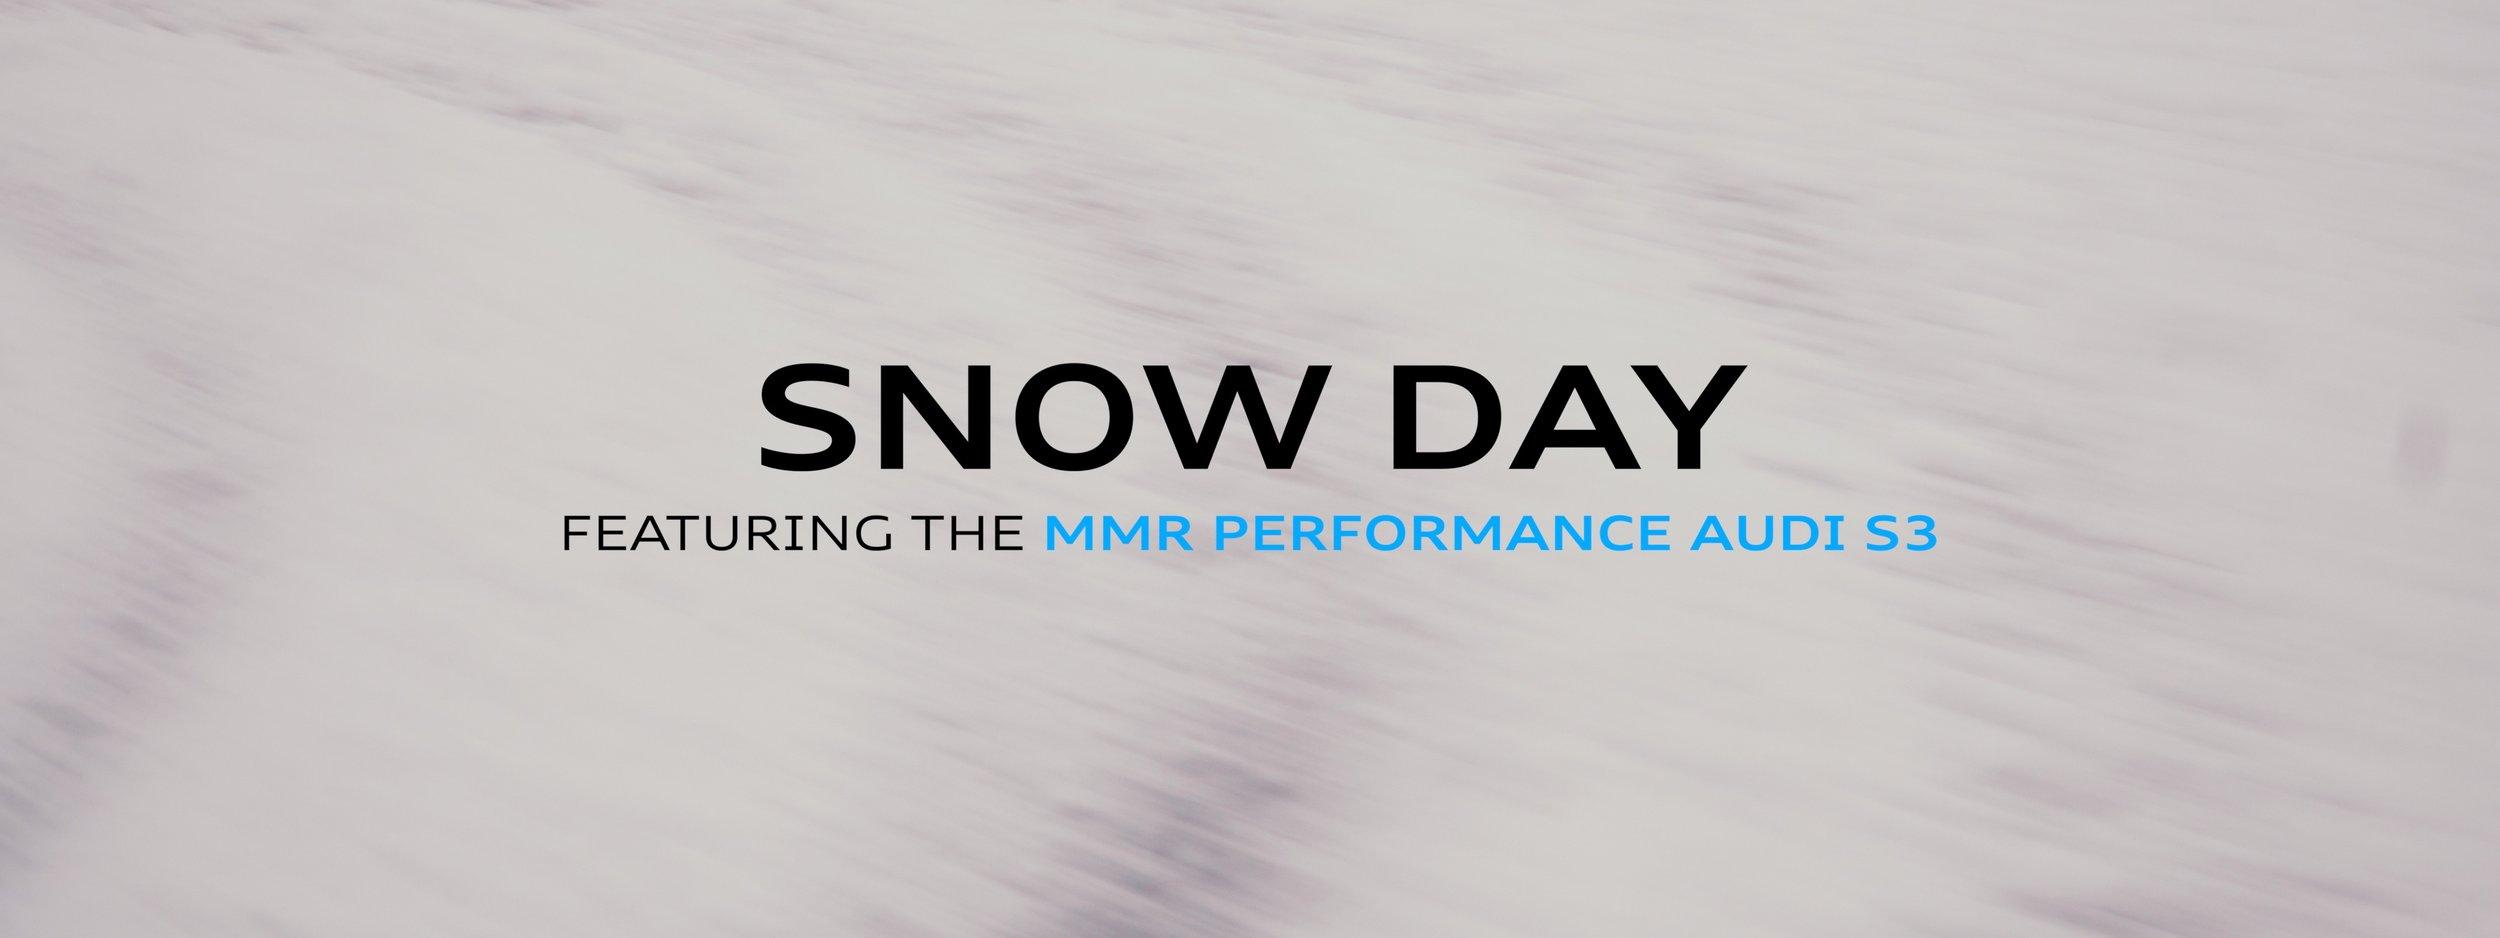 MMR AUDI S3 | SNOW DAY sc4.jpg